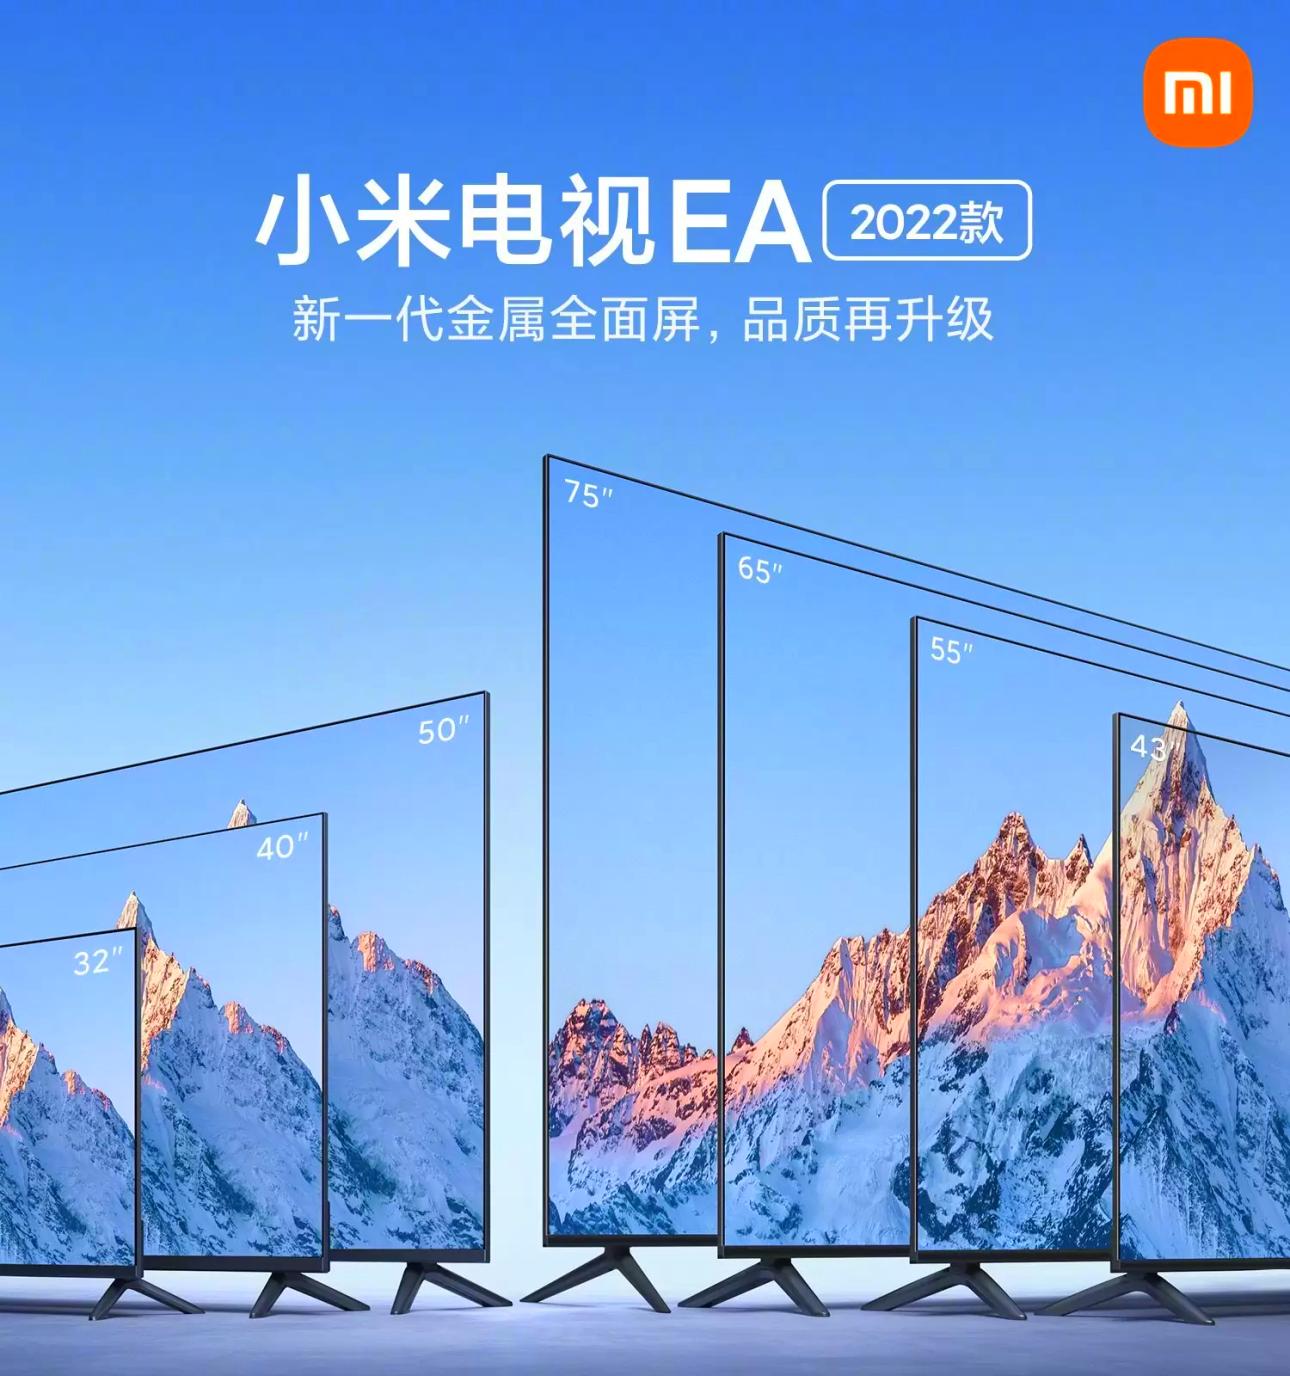 Xiaomi Predstavila Novuyu Linejku Smart Televizorov Mi Tv Ea 2022 1